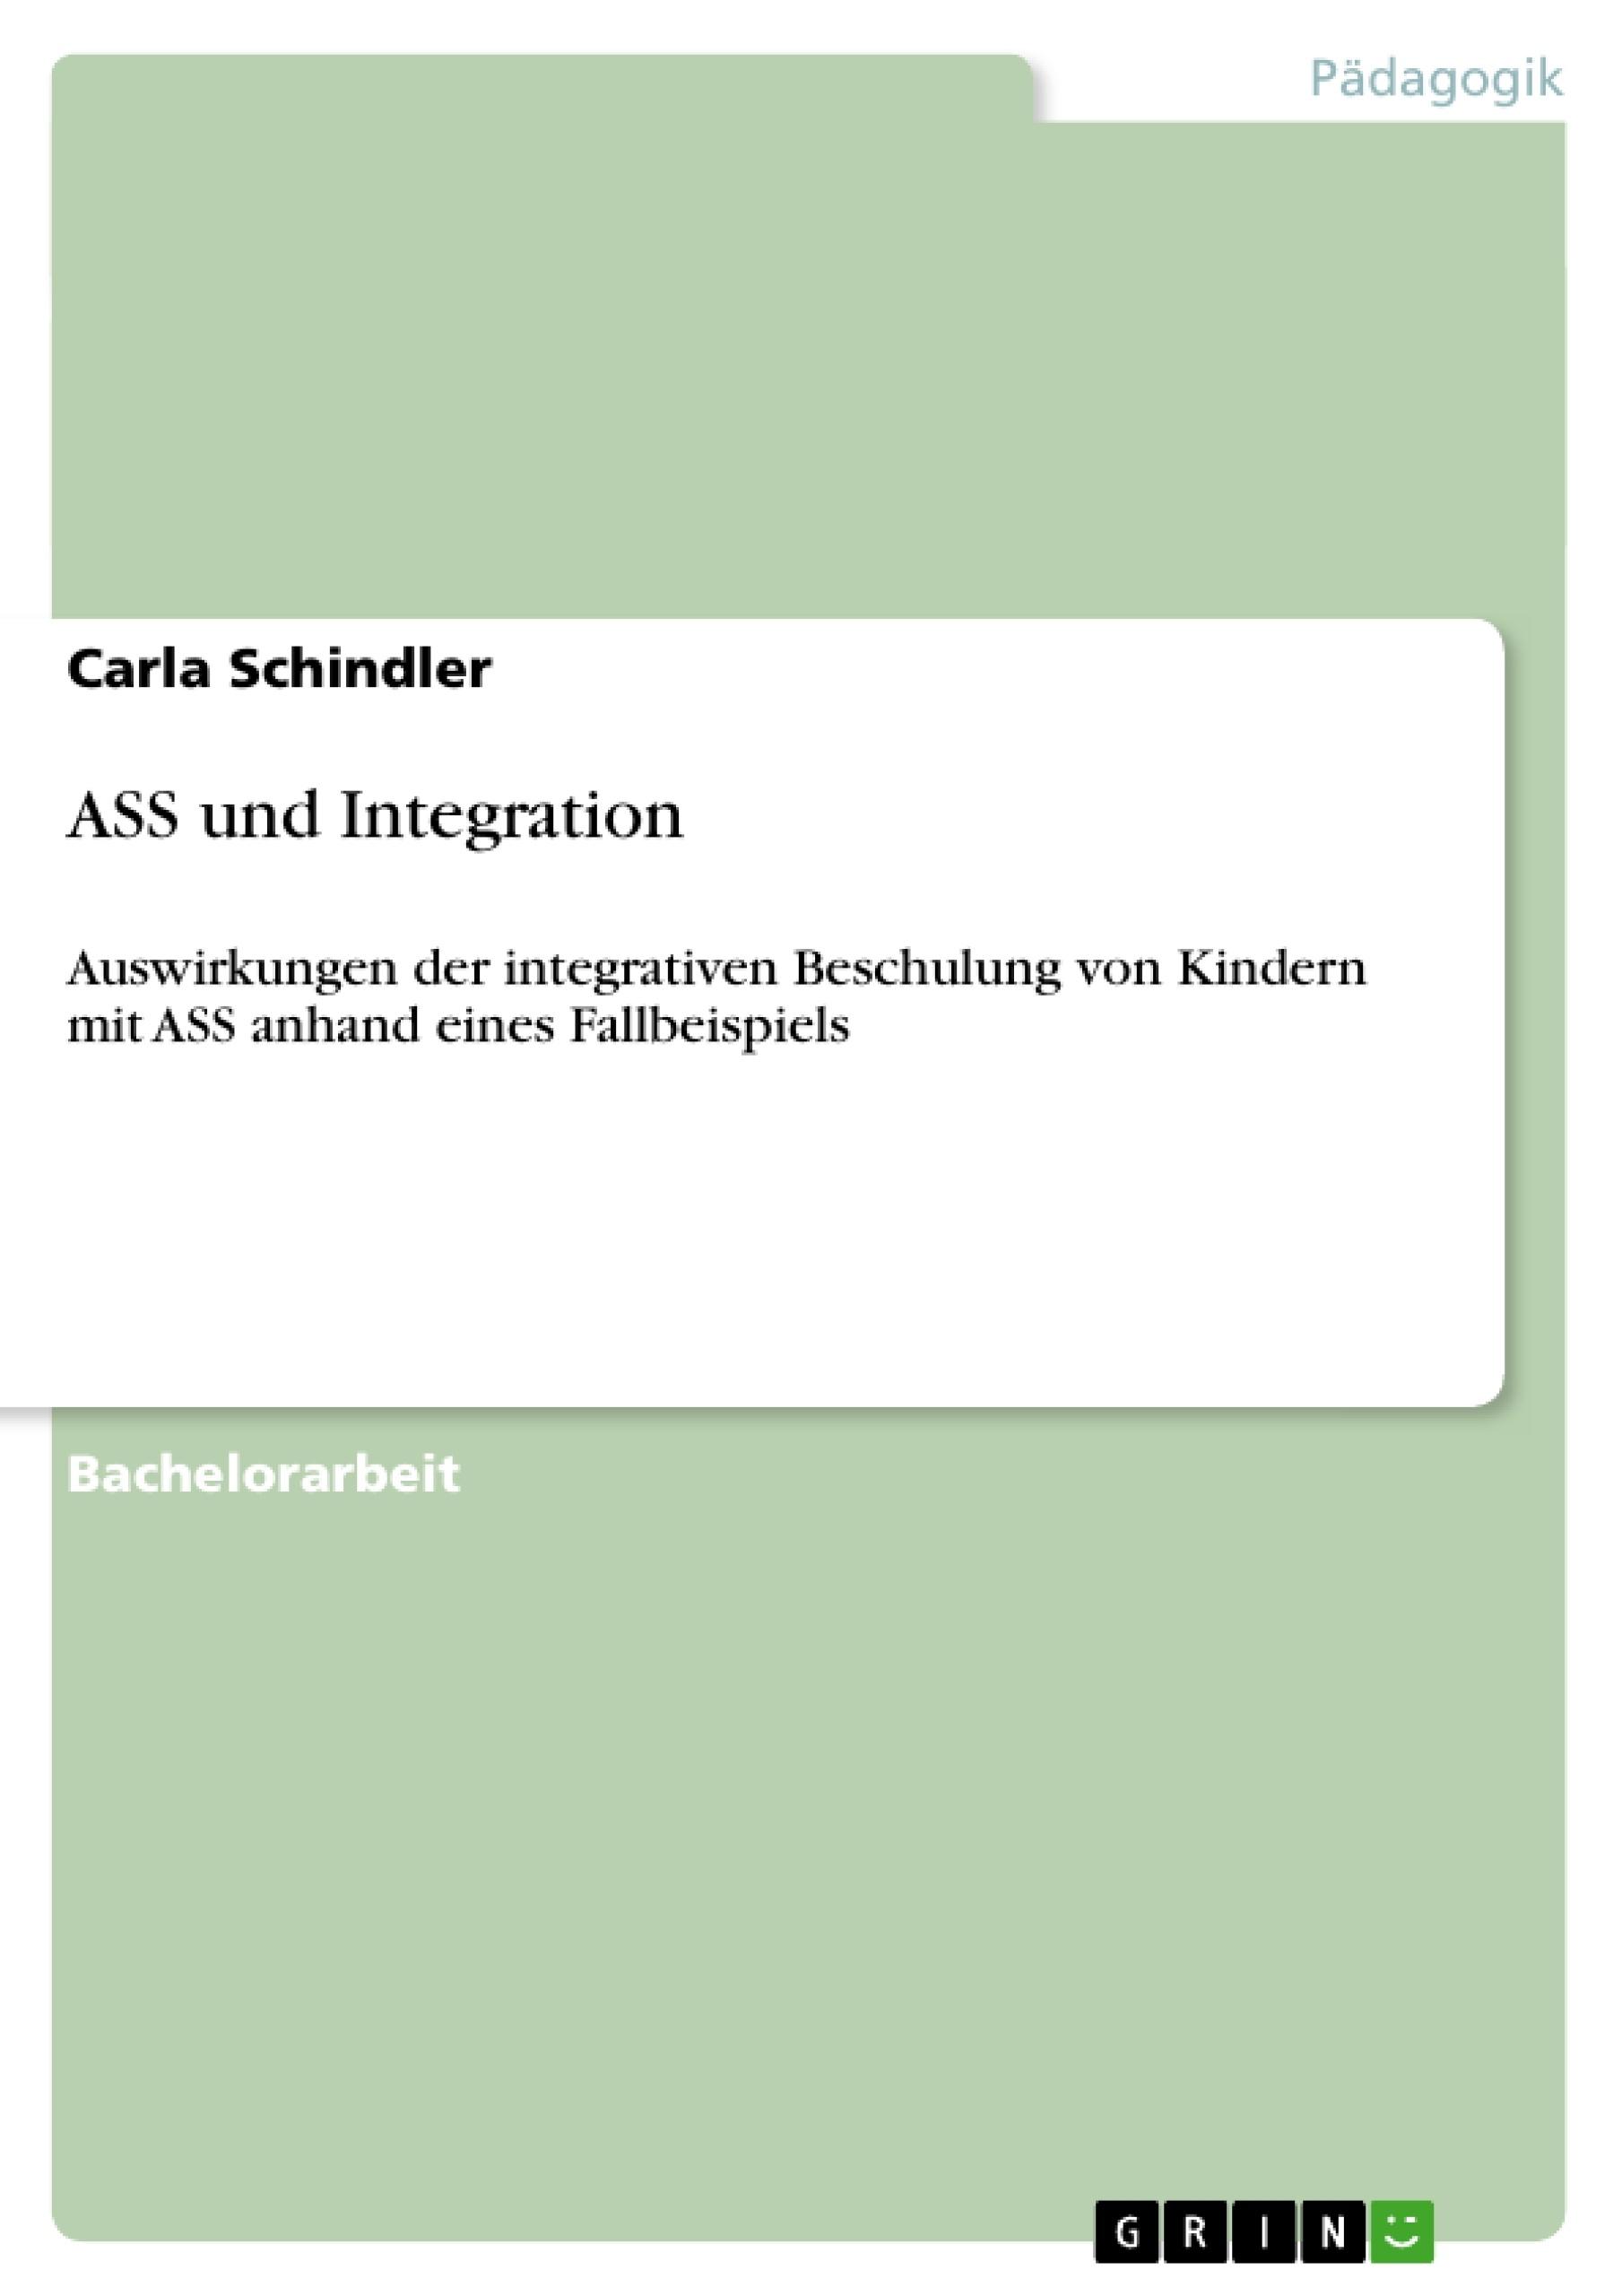 Titel: ASS und Integration